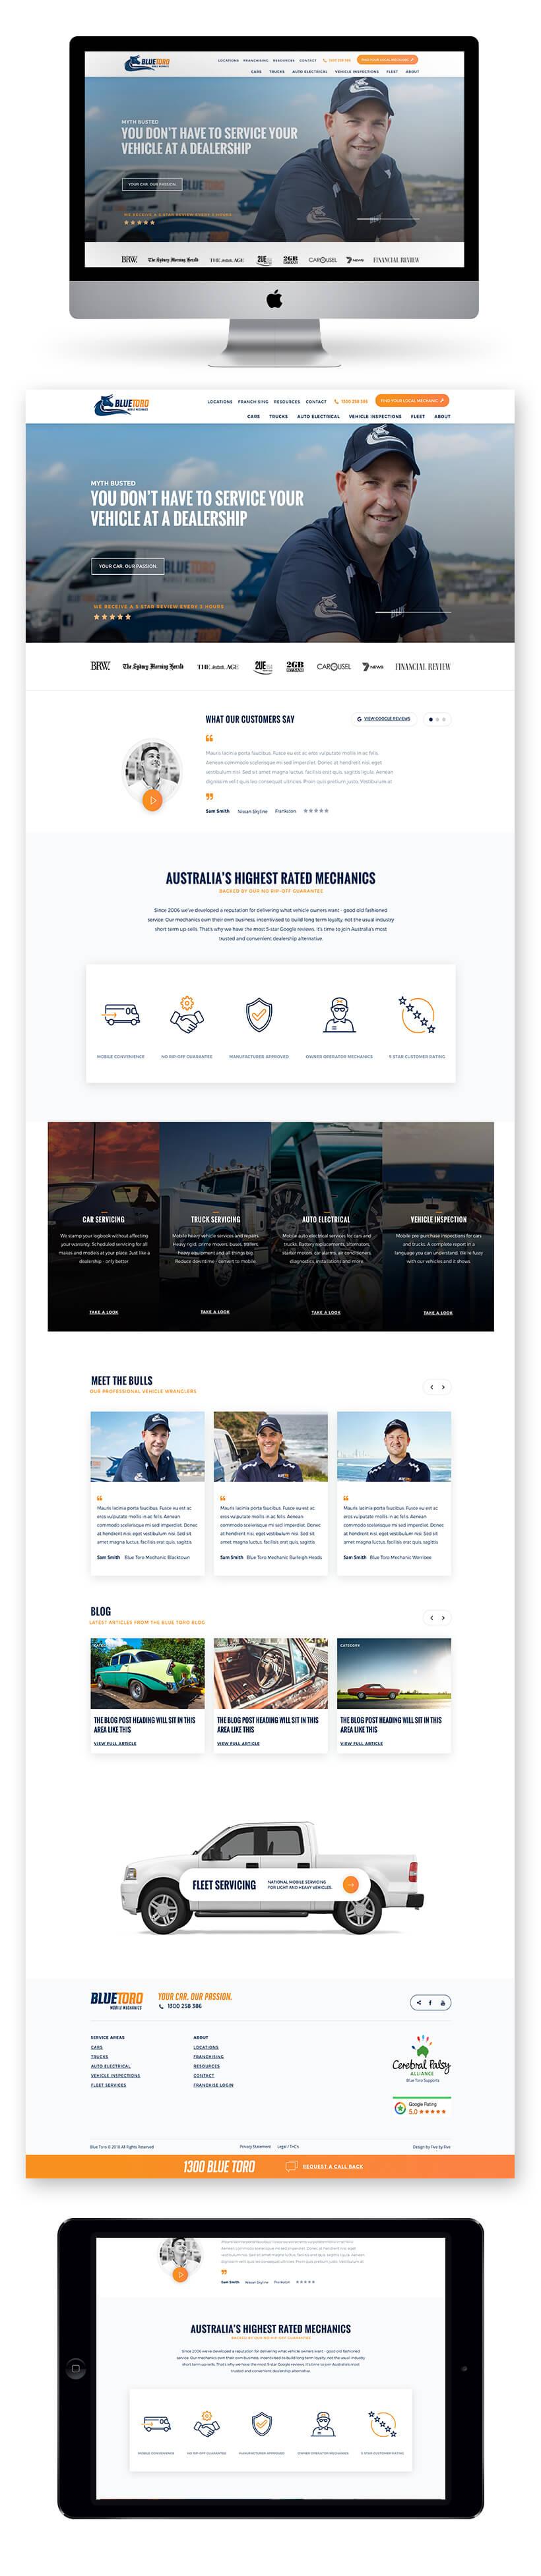 Blue Toro Mobile Mechanics Site